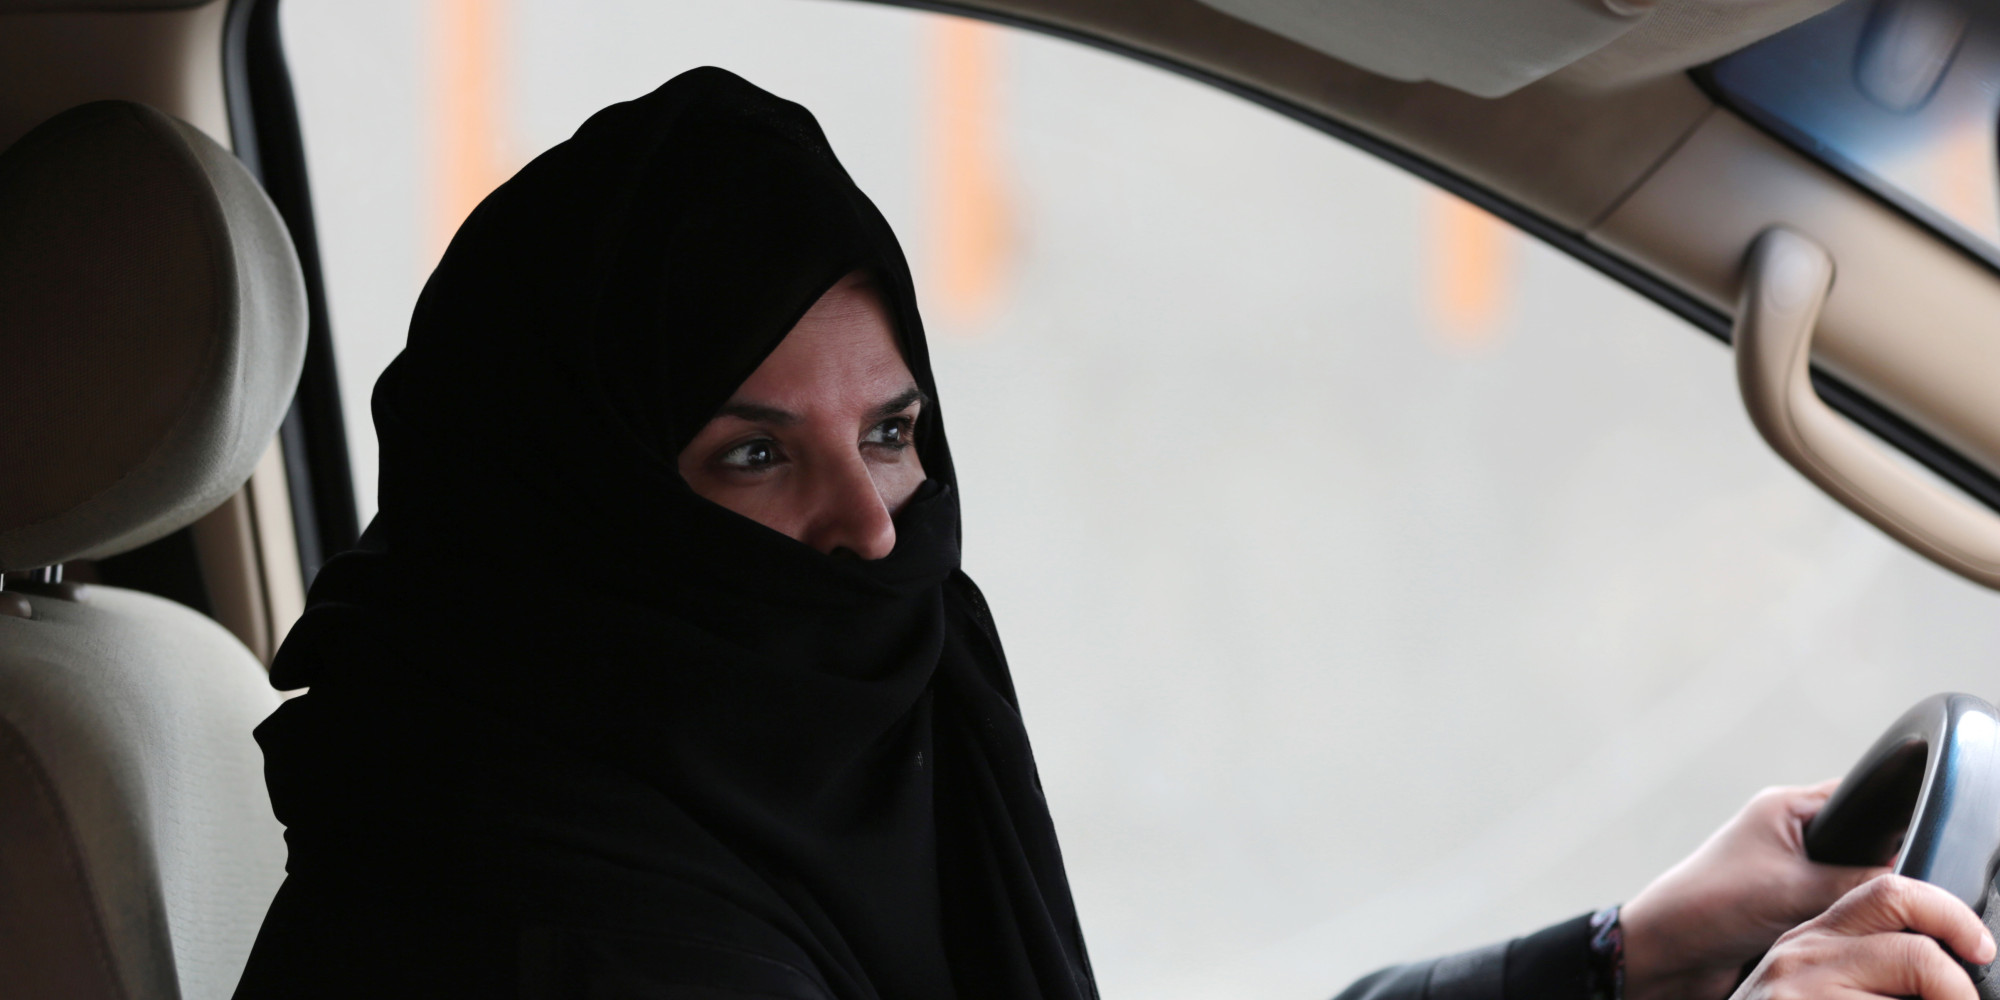 saudi arabian women Saudi women rarely wear  khashoggi points out that trump is an extreme right wing populist who probably only thinks of the arabian gulf  saudiwoman's weblog.